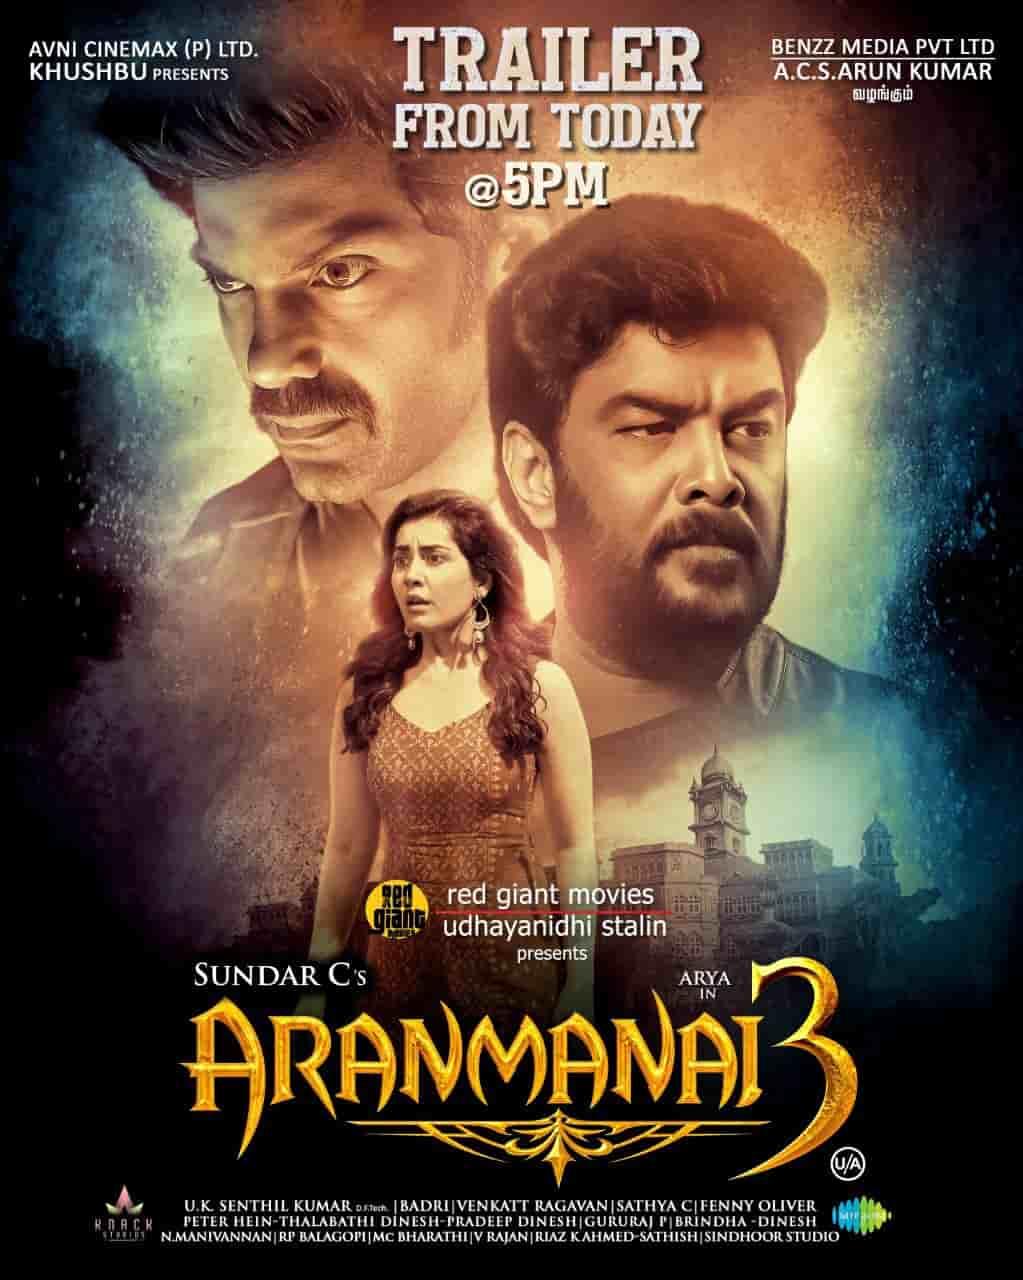 Aranmanai 3 - Official Trailer Featuring Arya Raashi Khanna directed by Sundar C